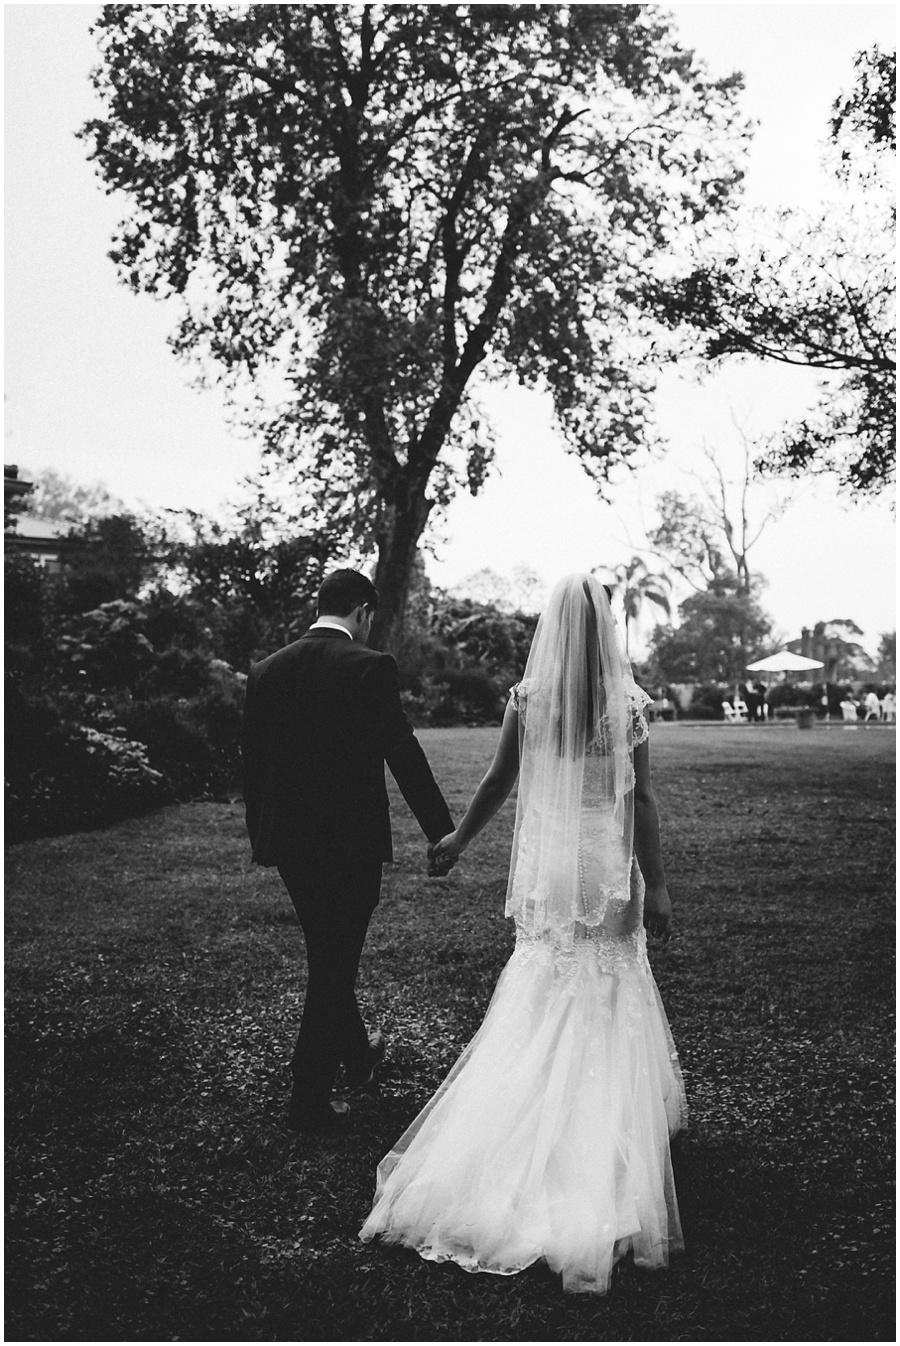 licinda-cohan-kok-wedding-barker-manor-kloof-christy-long-exposure_0068